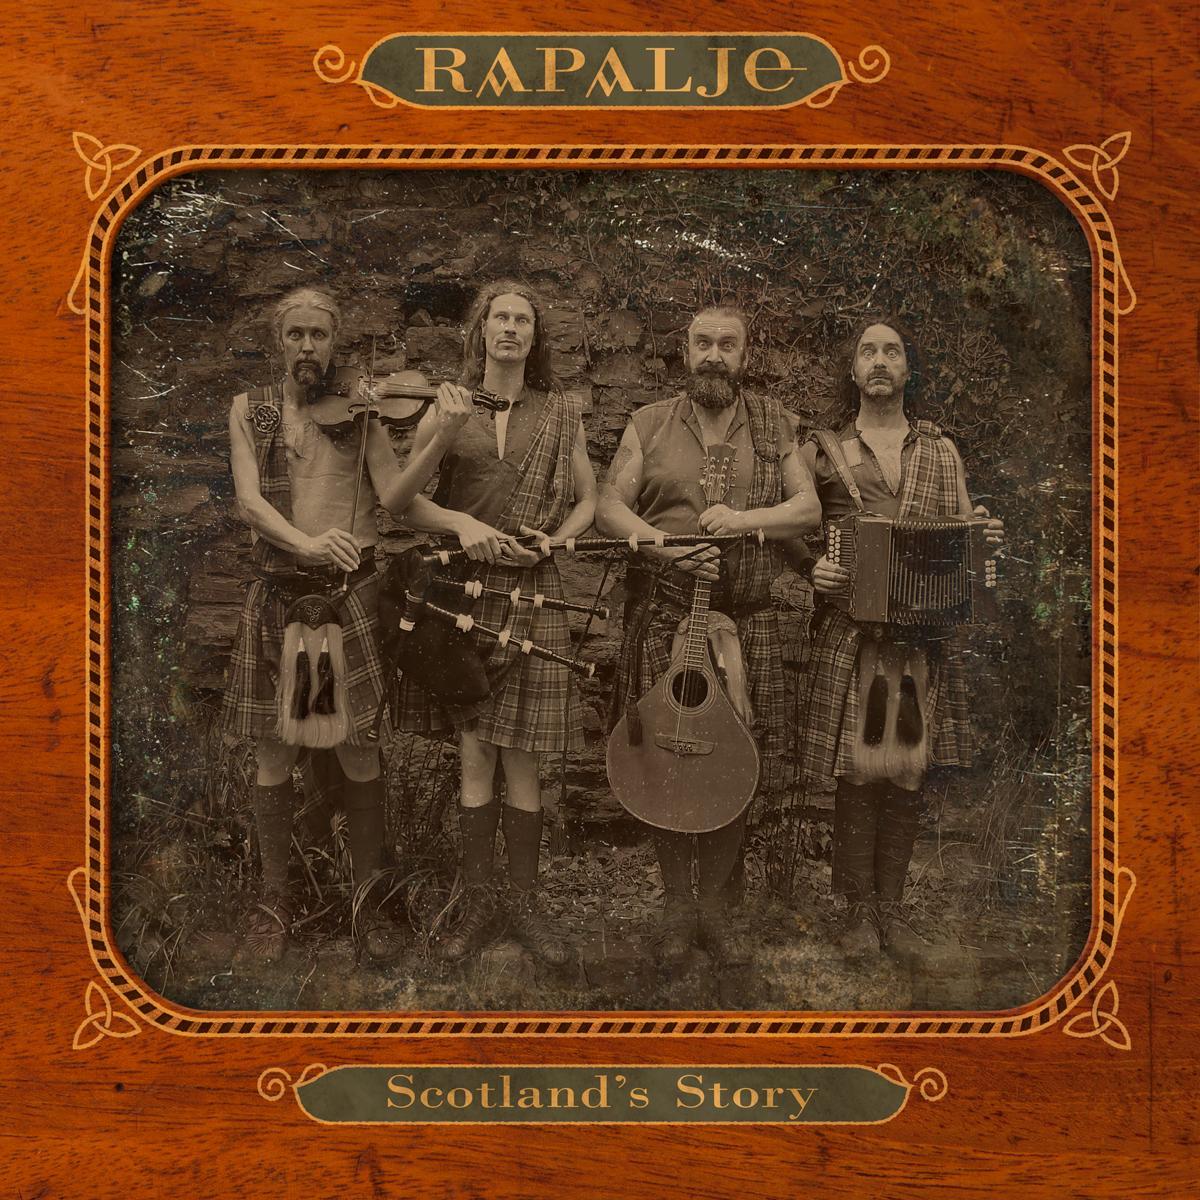 schotlands-story-rapalje-album-back